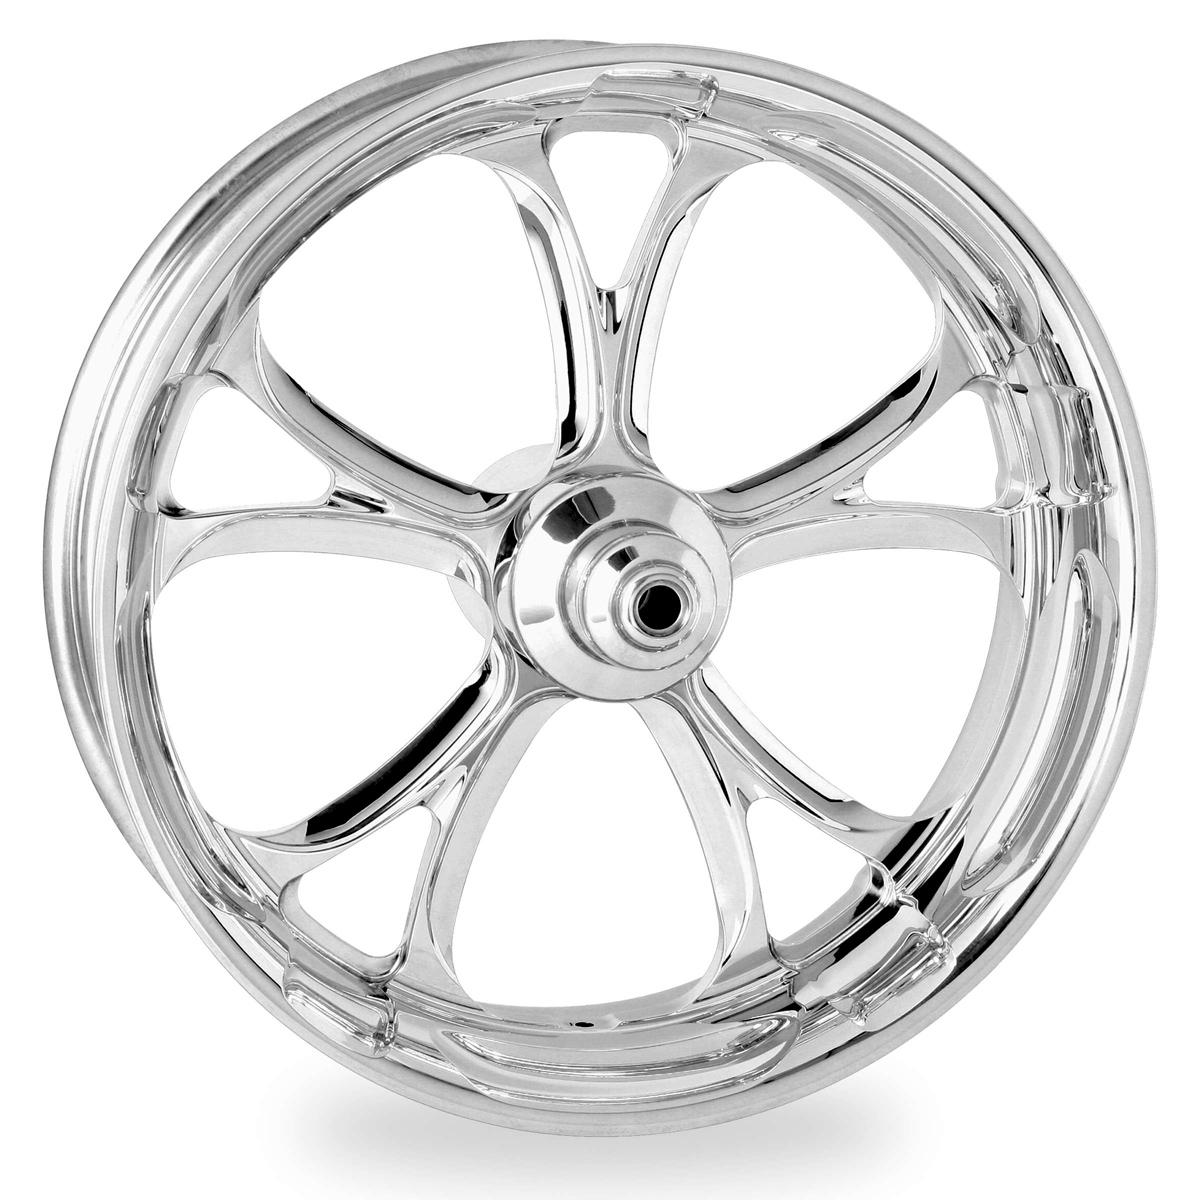 Performance Machine Luxe Chrome Rear Wheel 18x4.25 Non-ABS